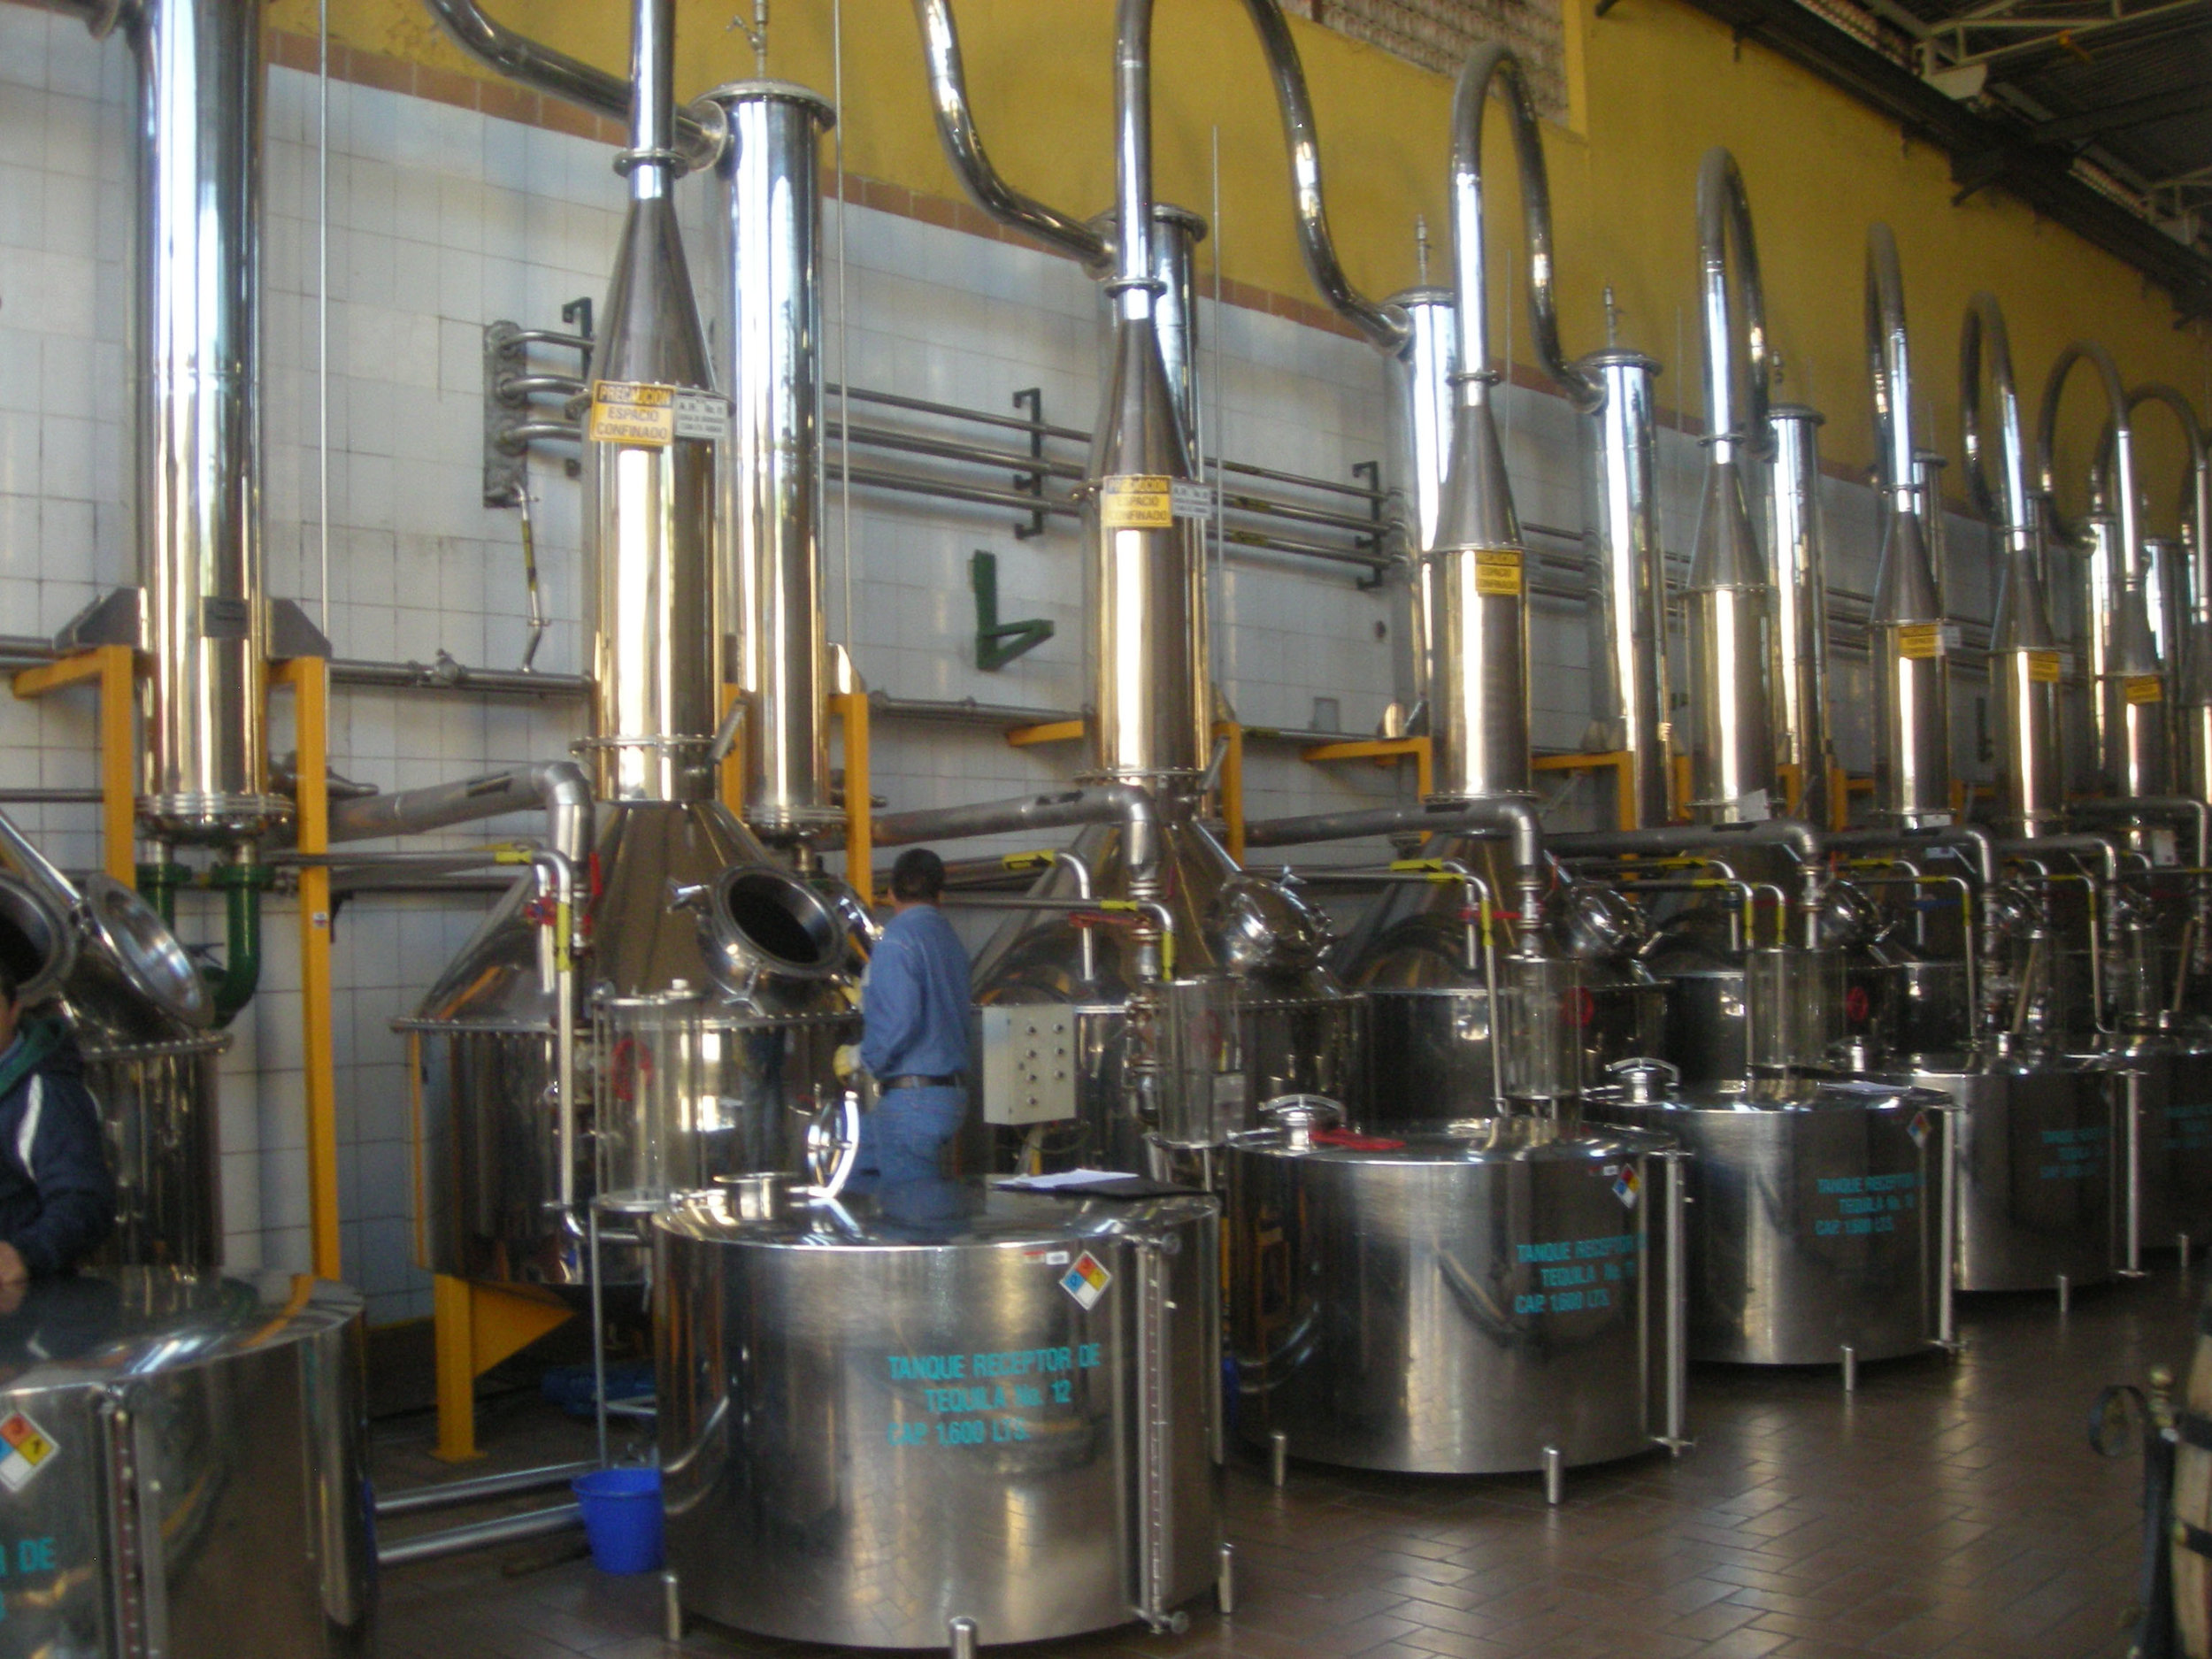 inside the brewery.jpg